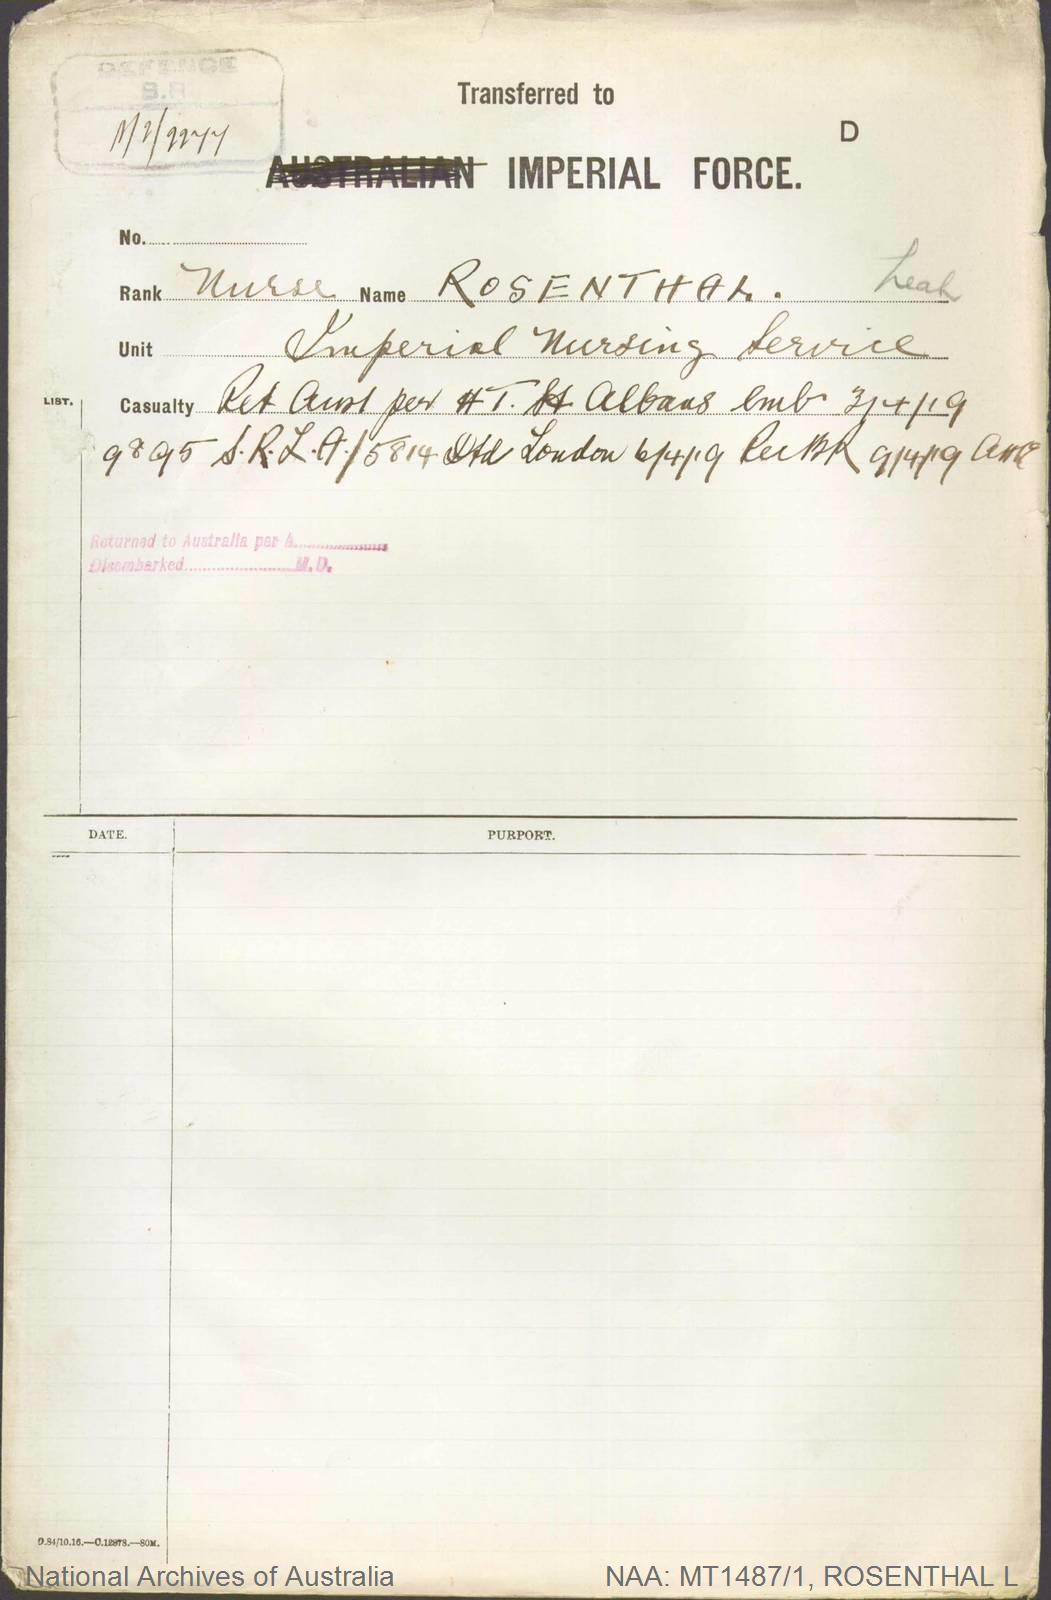 ROSENTHAL Leah - Imperial Nursing Service - returned to Australia per St Albans 3 April 1919